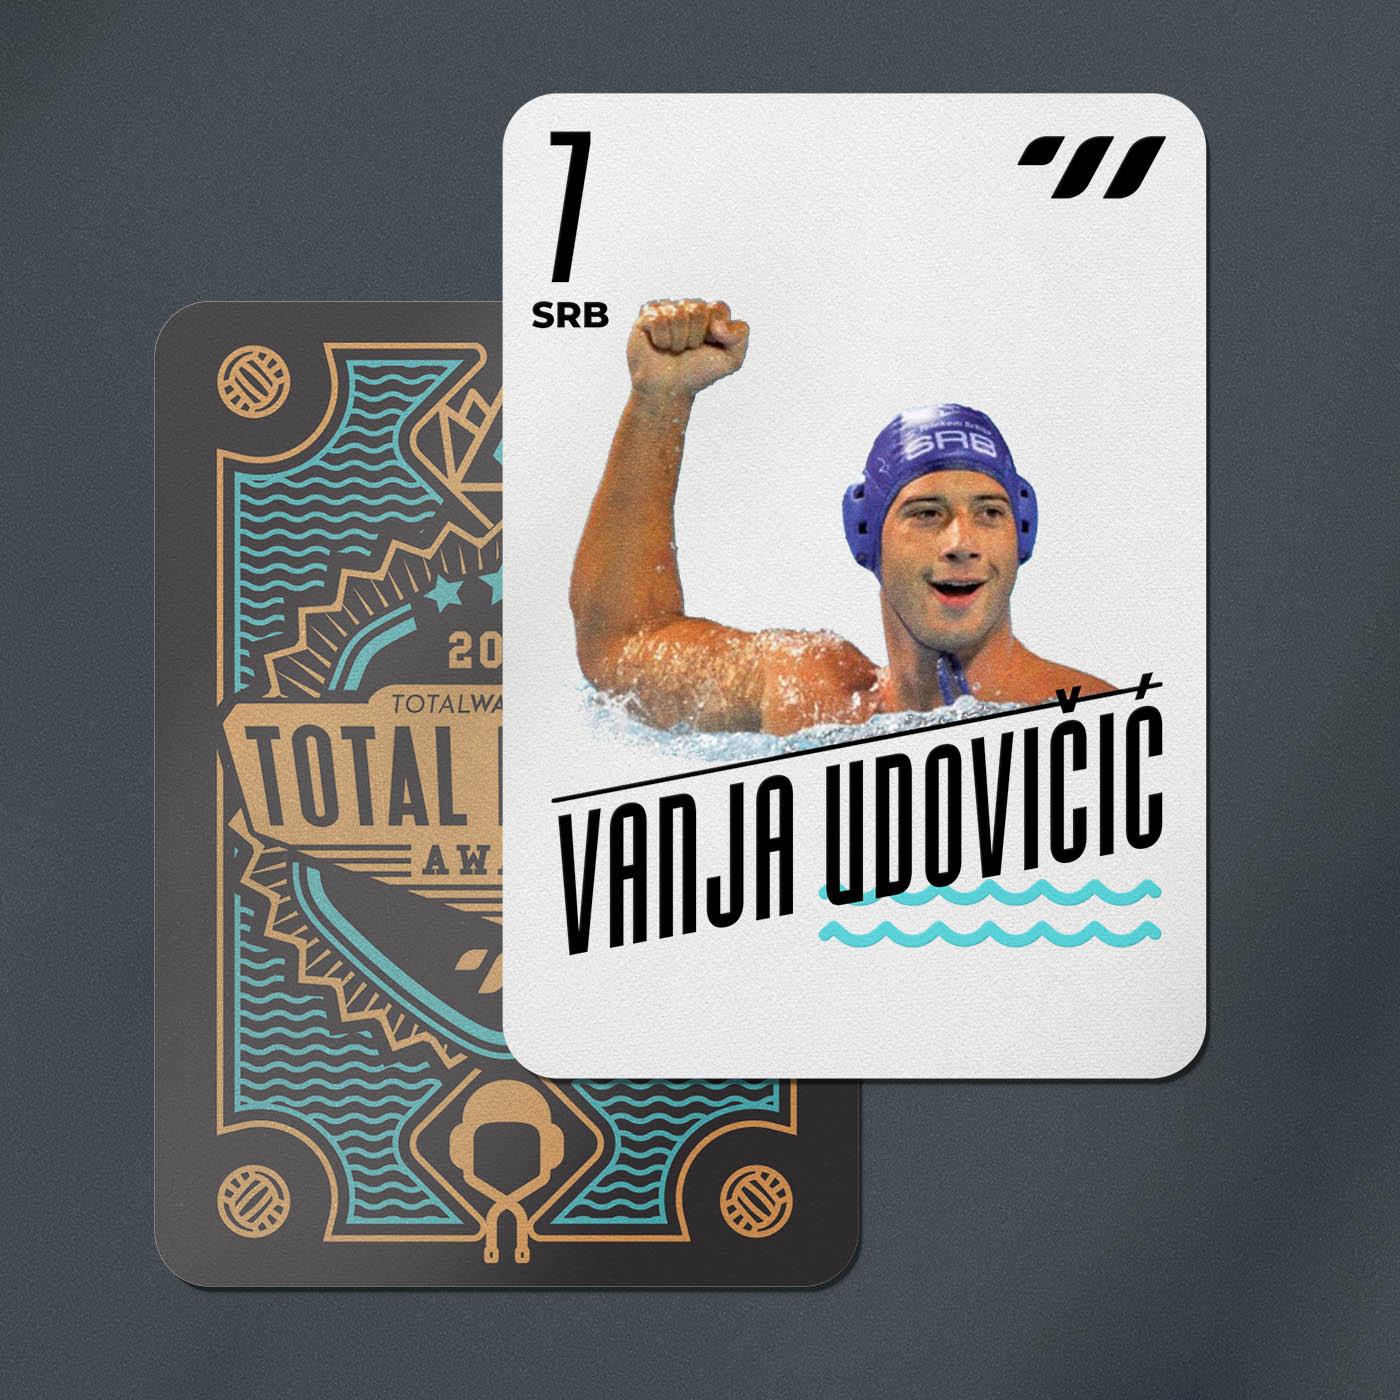 CENTER BACK - Vanja Udovicic (SRB)